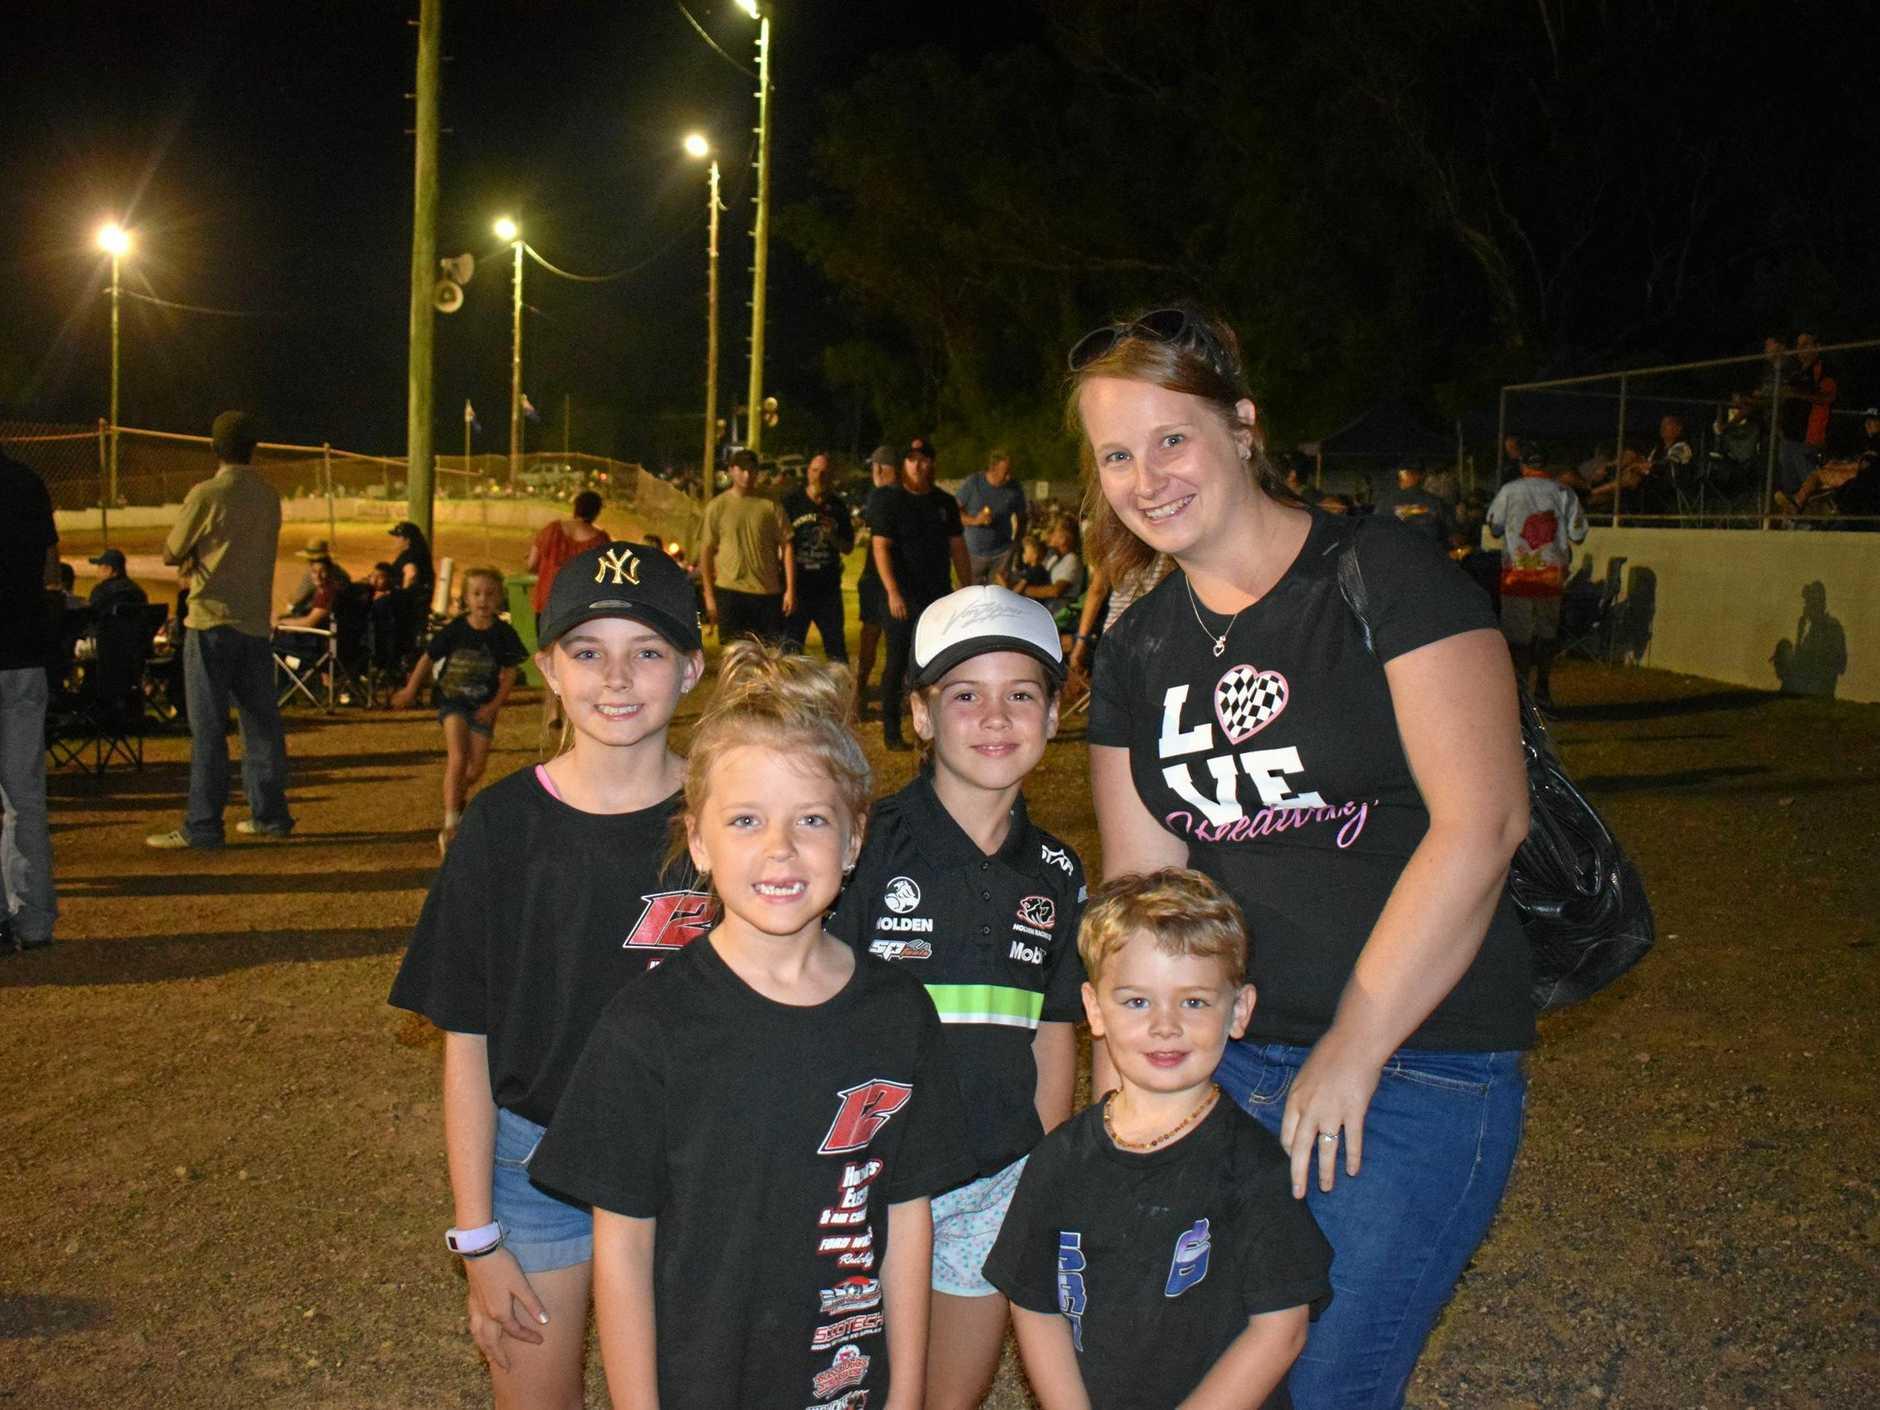 REV HEADS: Lili Hollyman, Reegan Hollyman, Emily Steffens, Elijah Raymont and Amy Strahl enjoy the speedway at Mothar Mountain.